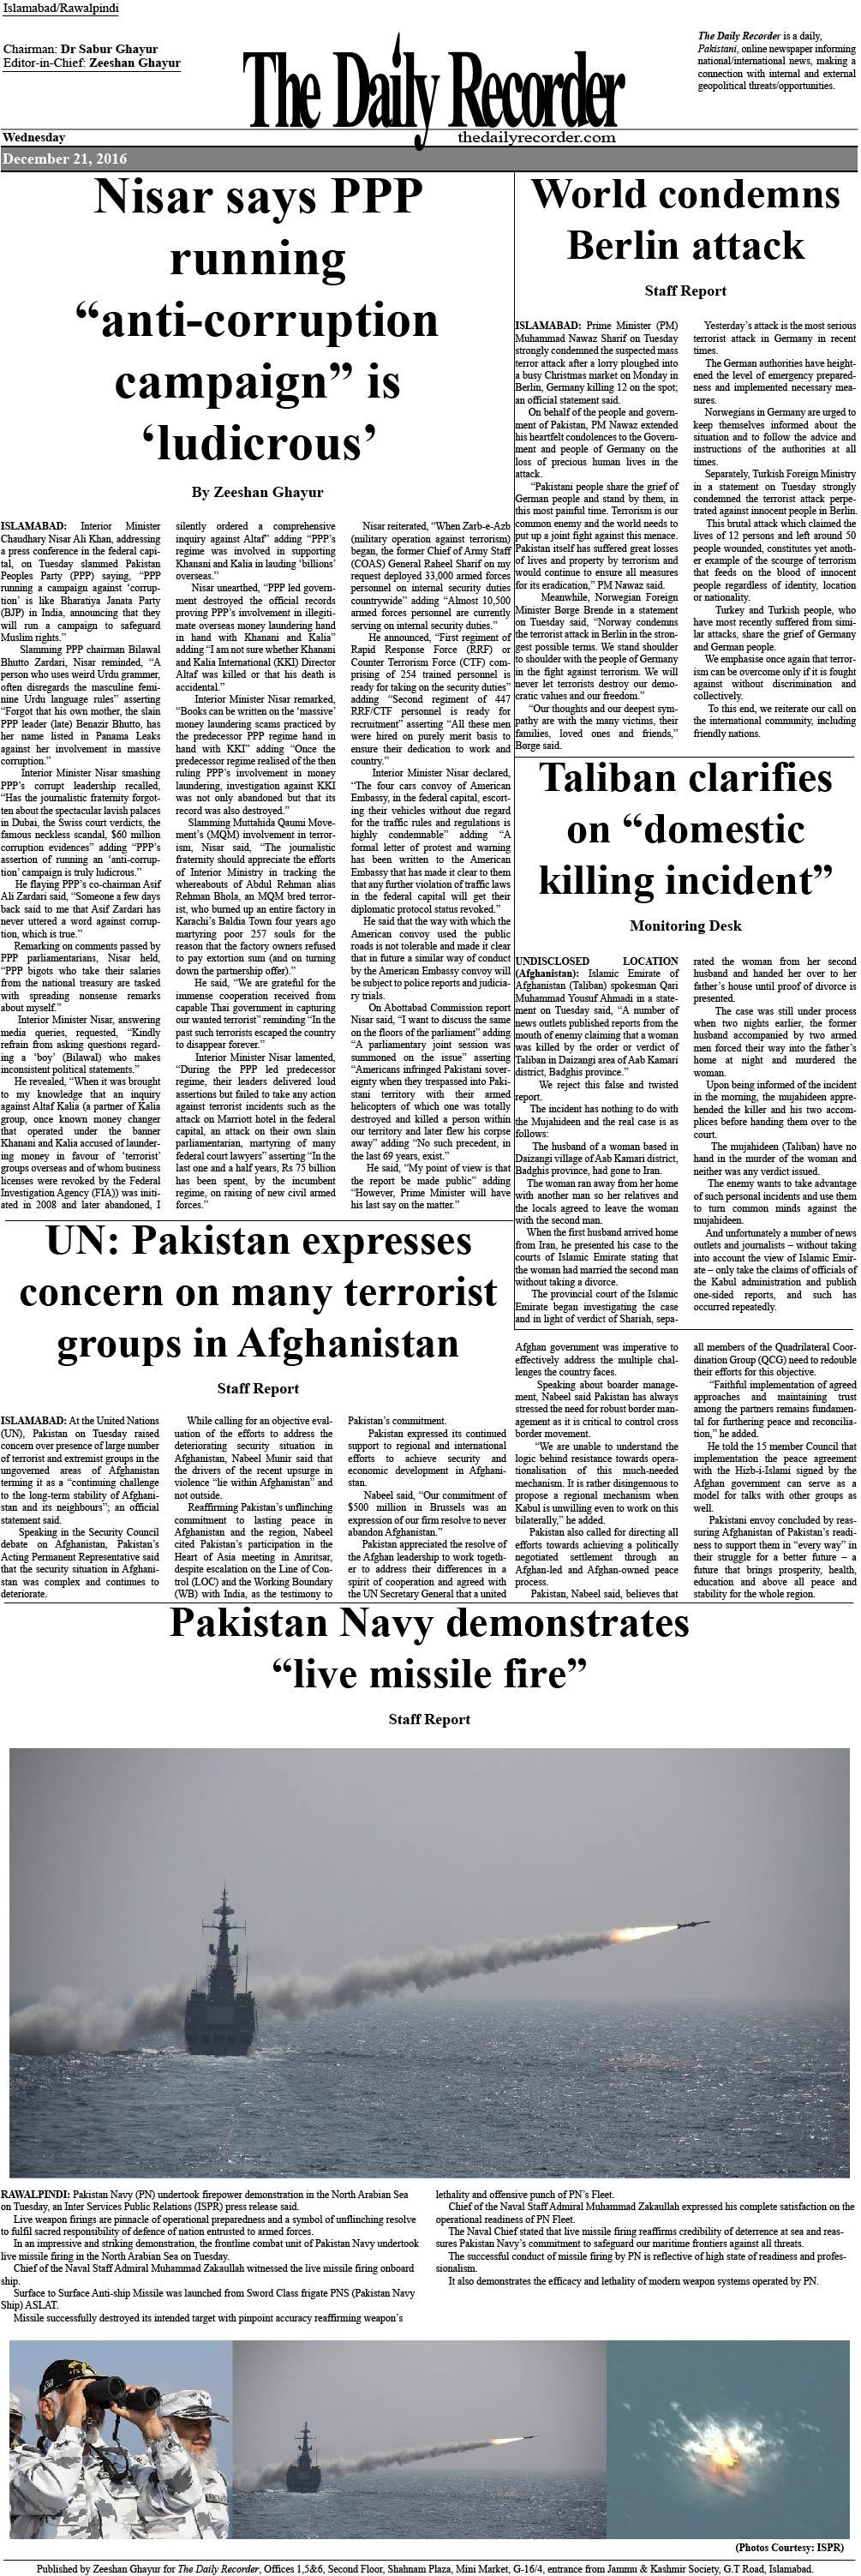 The Daily Recorder - Islamabad/Rawalpindi Daily E-Newspaper